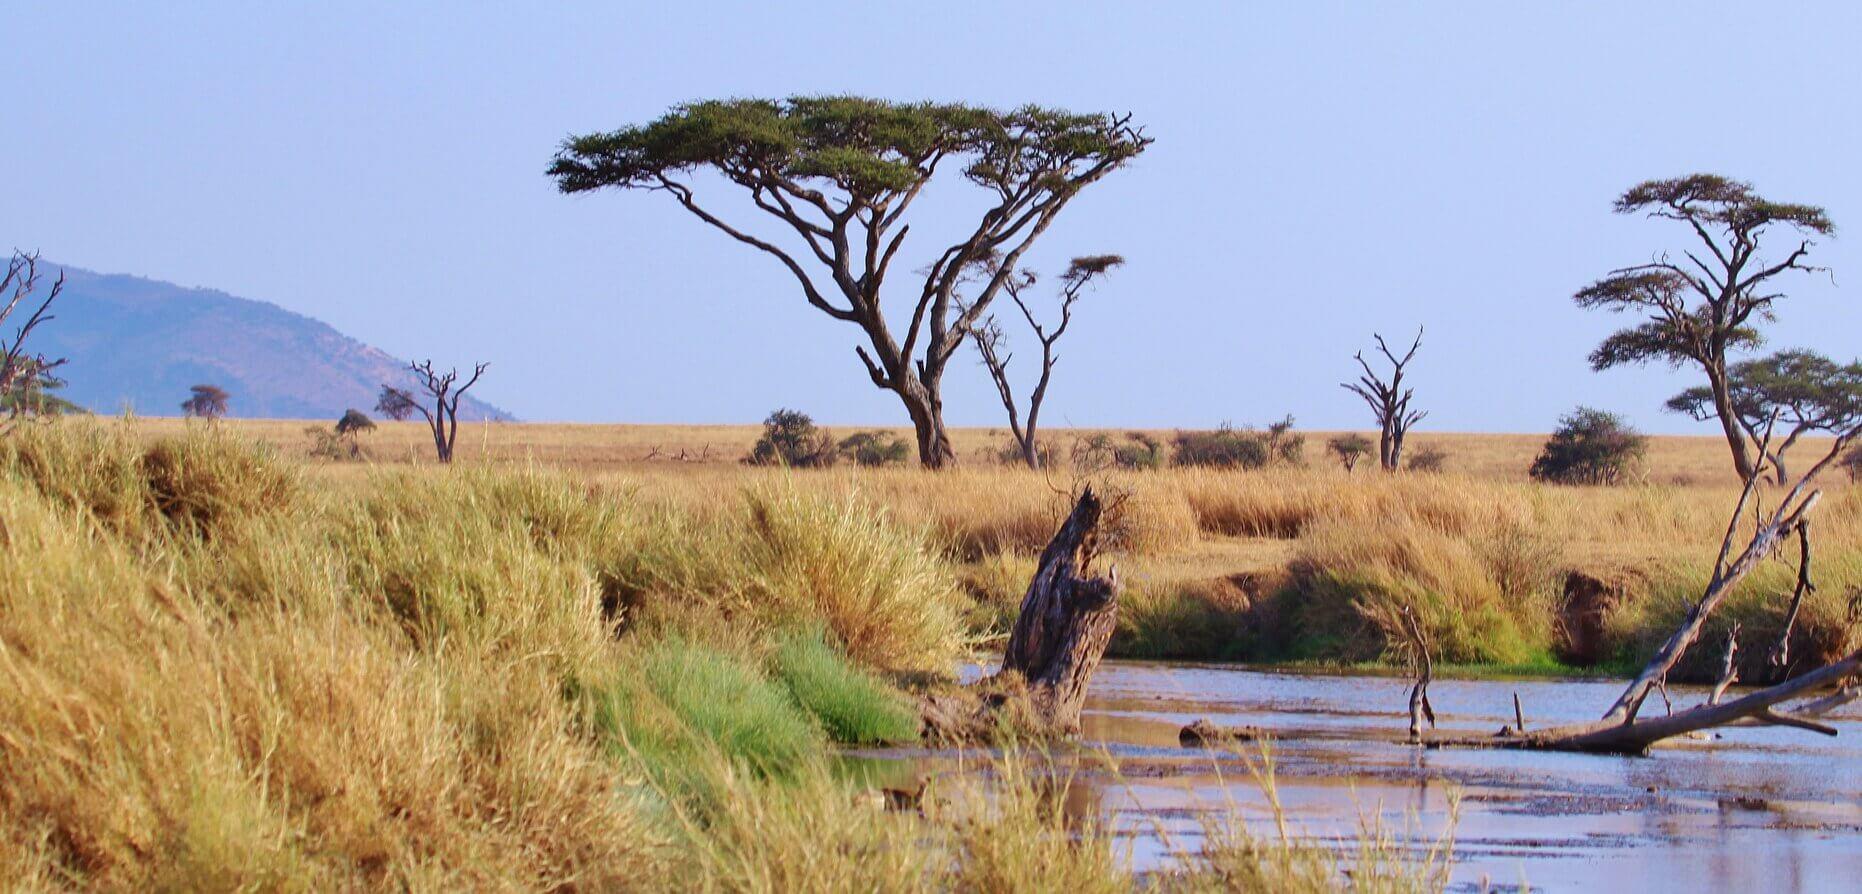 Tanzania - Country